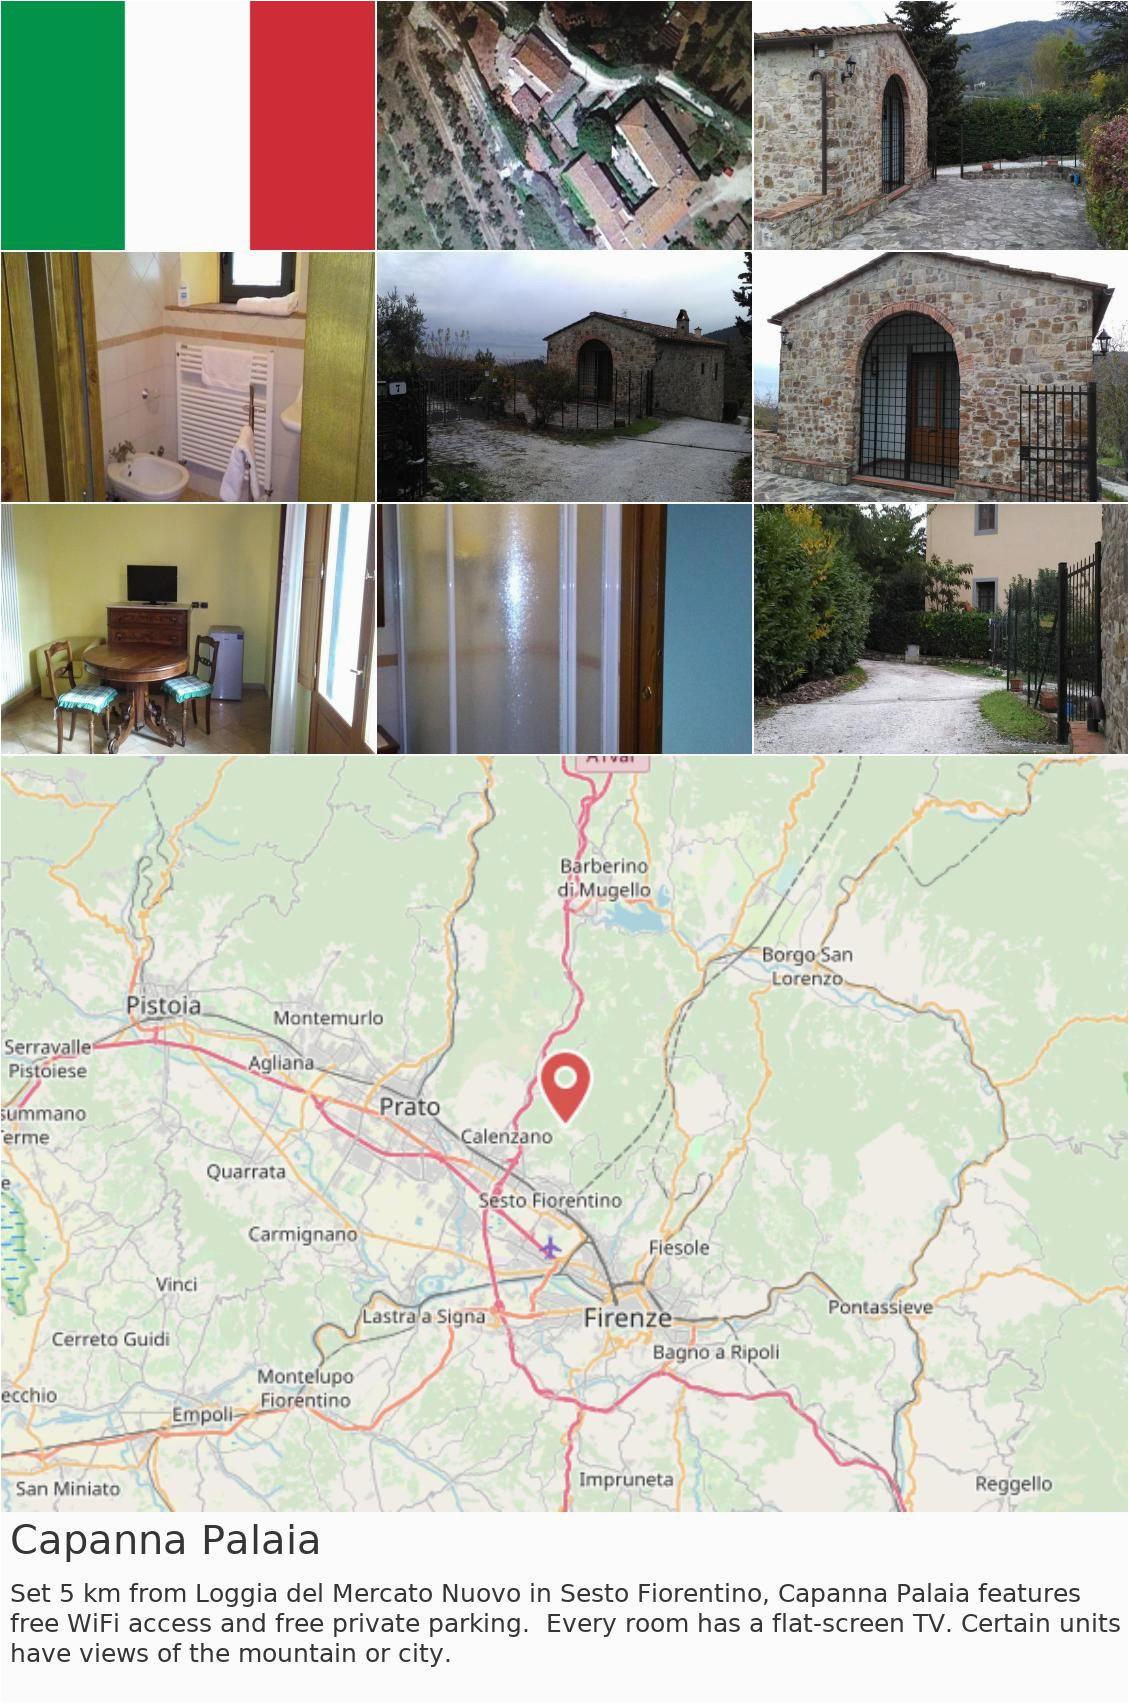 europe italy sesto fiorentino capanna palaia set 5 km from loggia